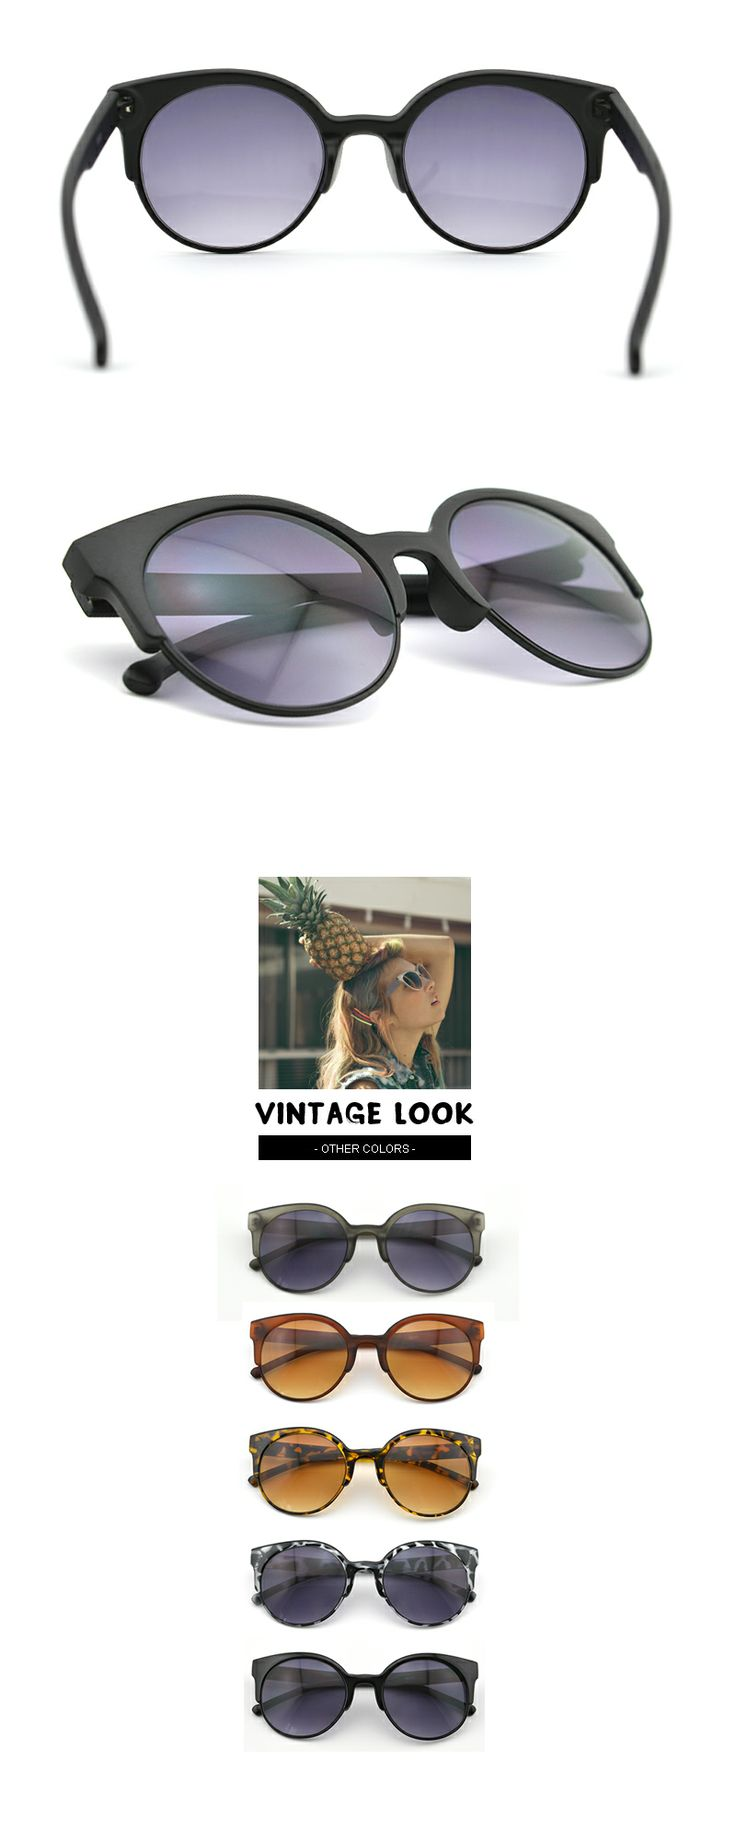 #Black Half band Sunglasses-Gradient lens-Retro Style Glasses-Slim Face #Half-band #Gradient lens #Vintage Look Visit - FUNMEMO.COM  to see More